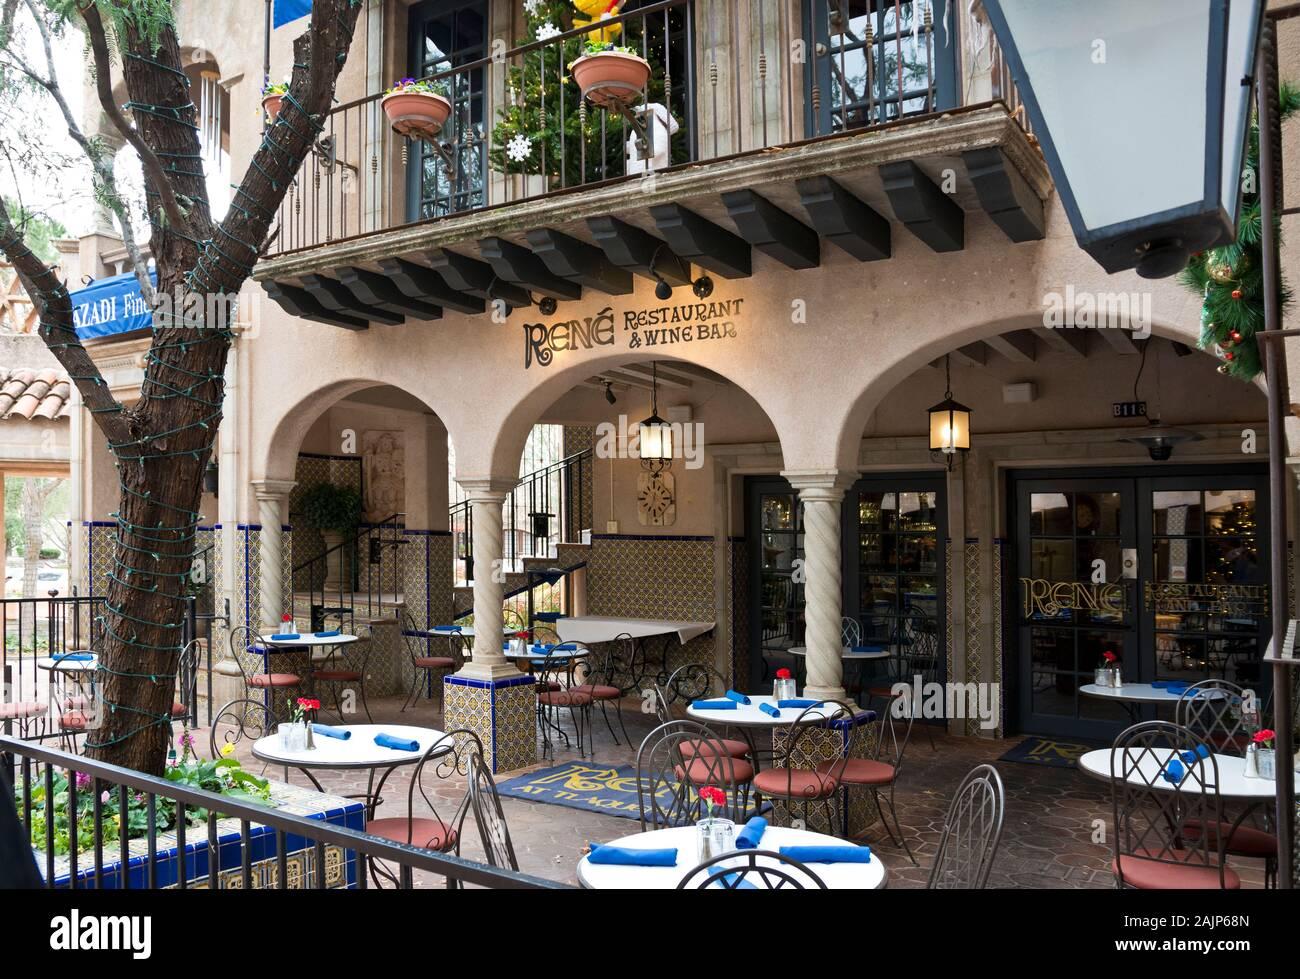 sedona-arizona-rene-restaurant-wine-bar-in-tlaquepaque-arts-shopping-village-2AJP68N.jpg